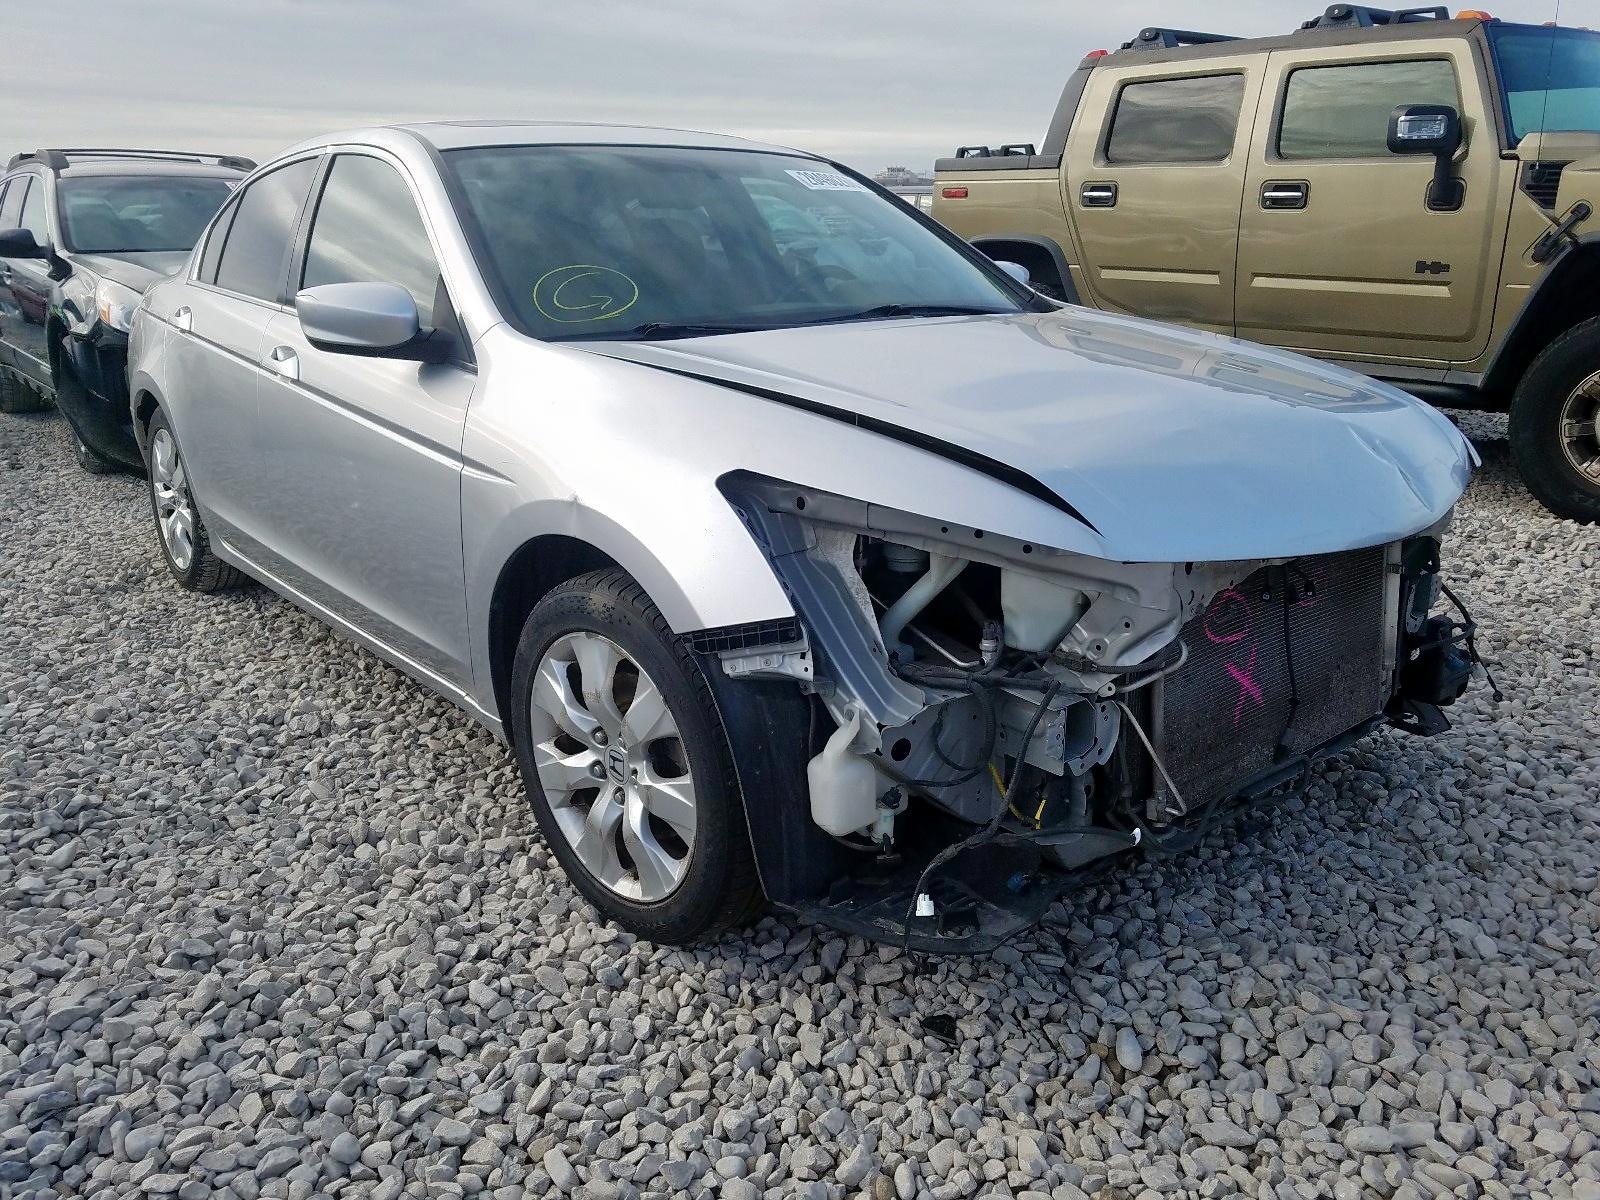 JHMCP26898C039017 - 2008 Honda Accord Exl 2.4L Left View